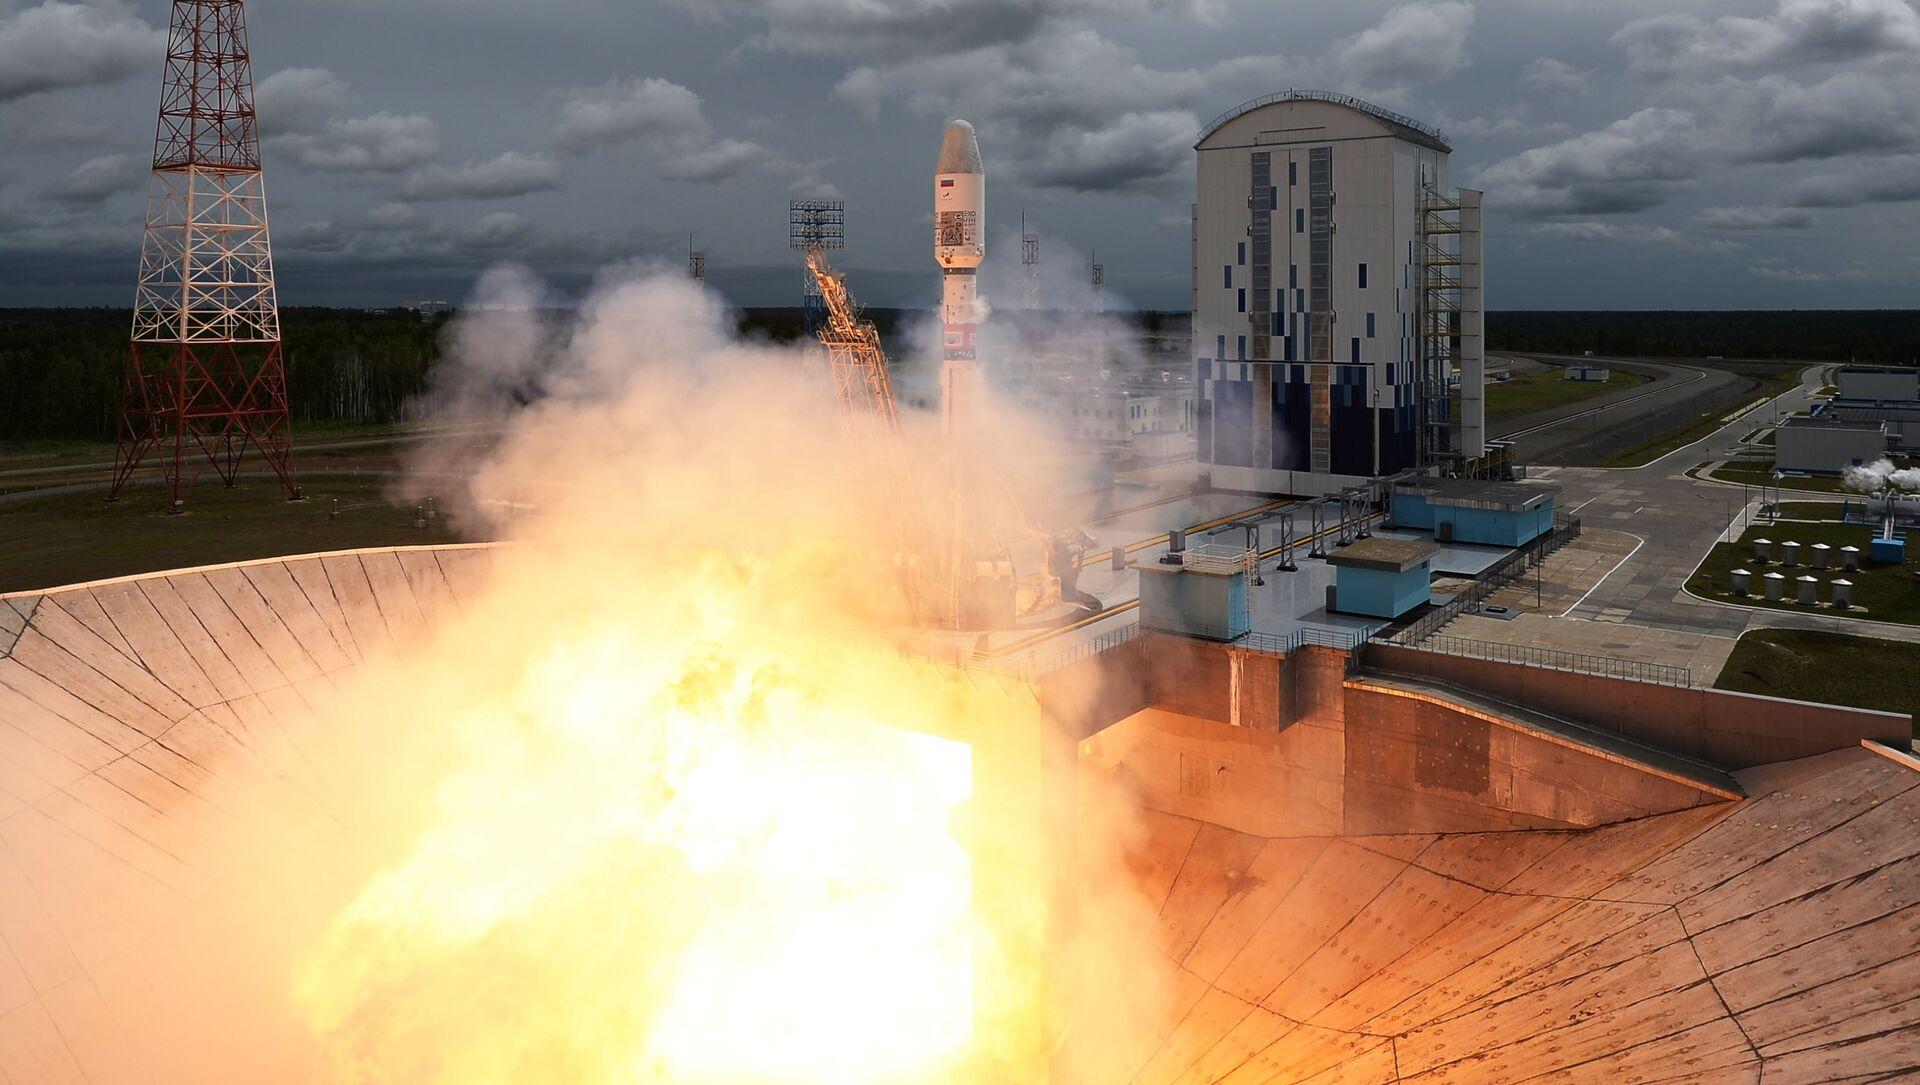 Lansiranje rakete-nosača Sojuz  - Sputnik Srbija, 1920, 26.04.2021